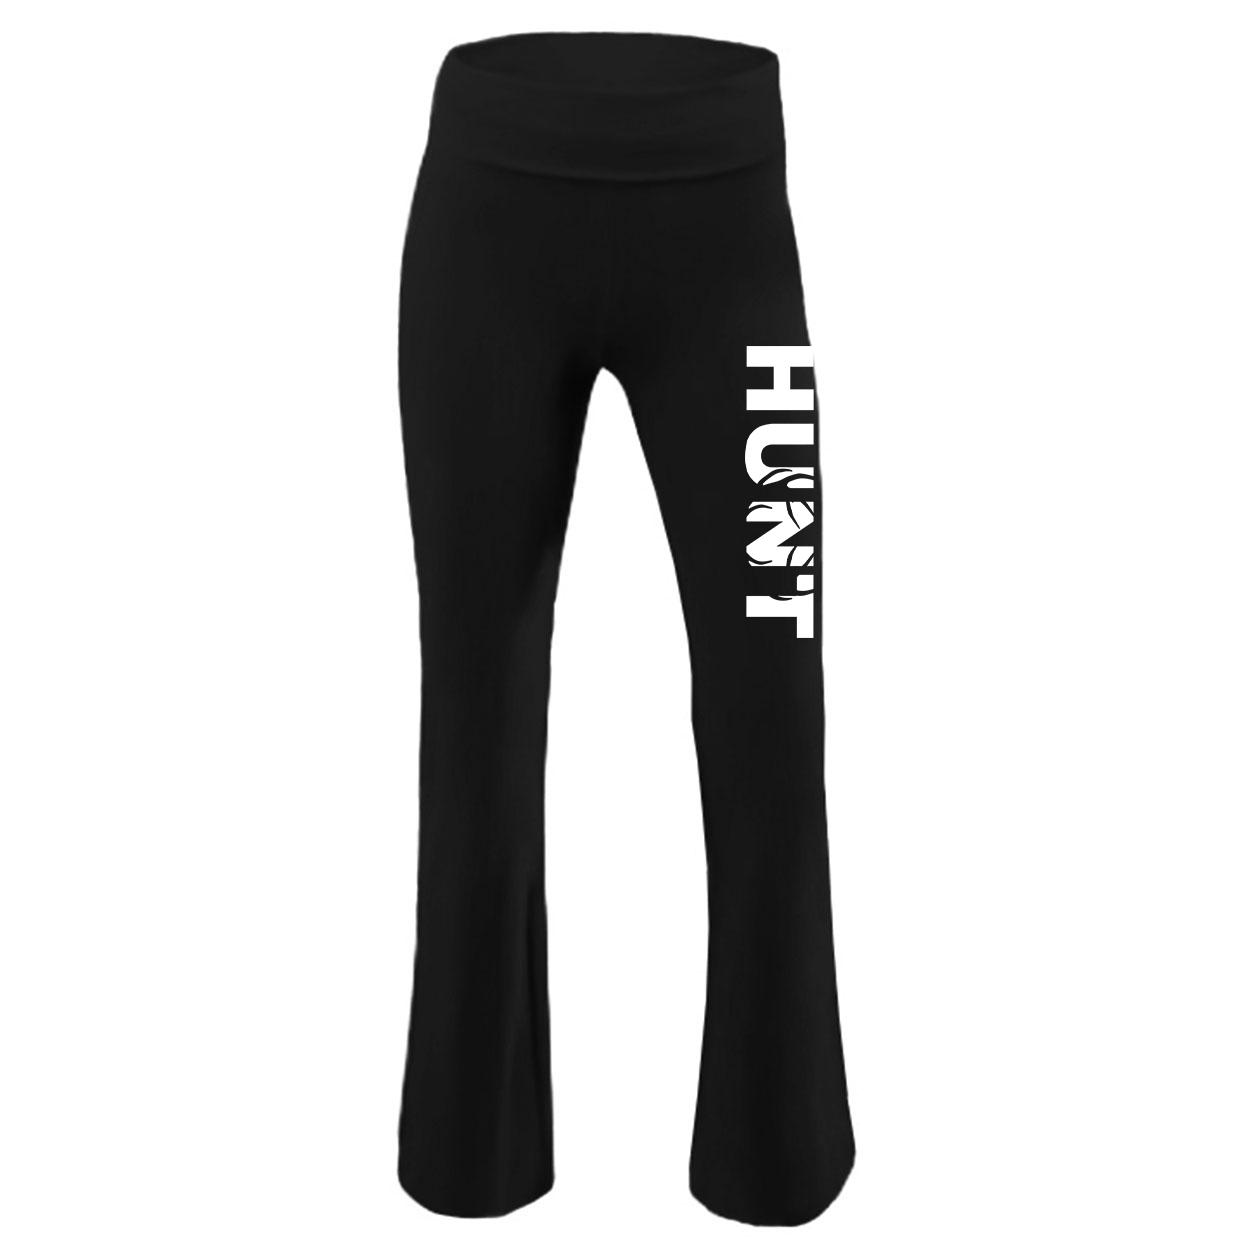 Hunt Rack Logo Classic Youth Girls Yoga Pants Black (White Logo)